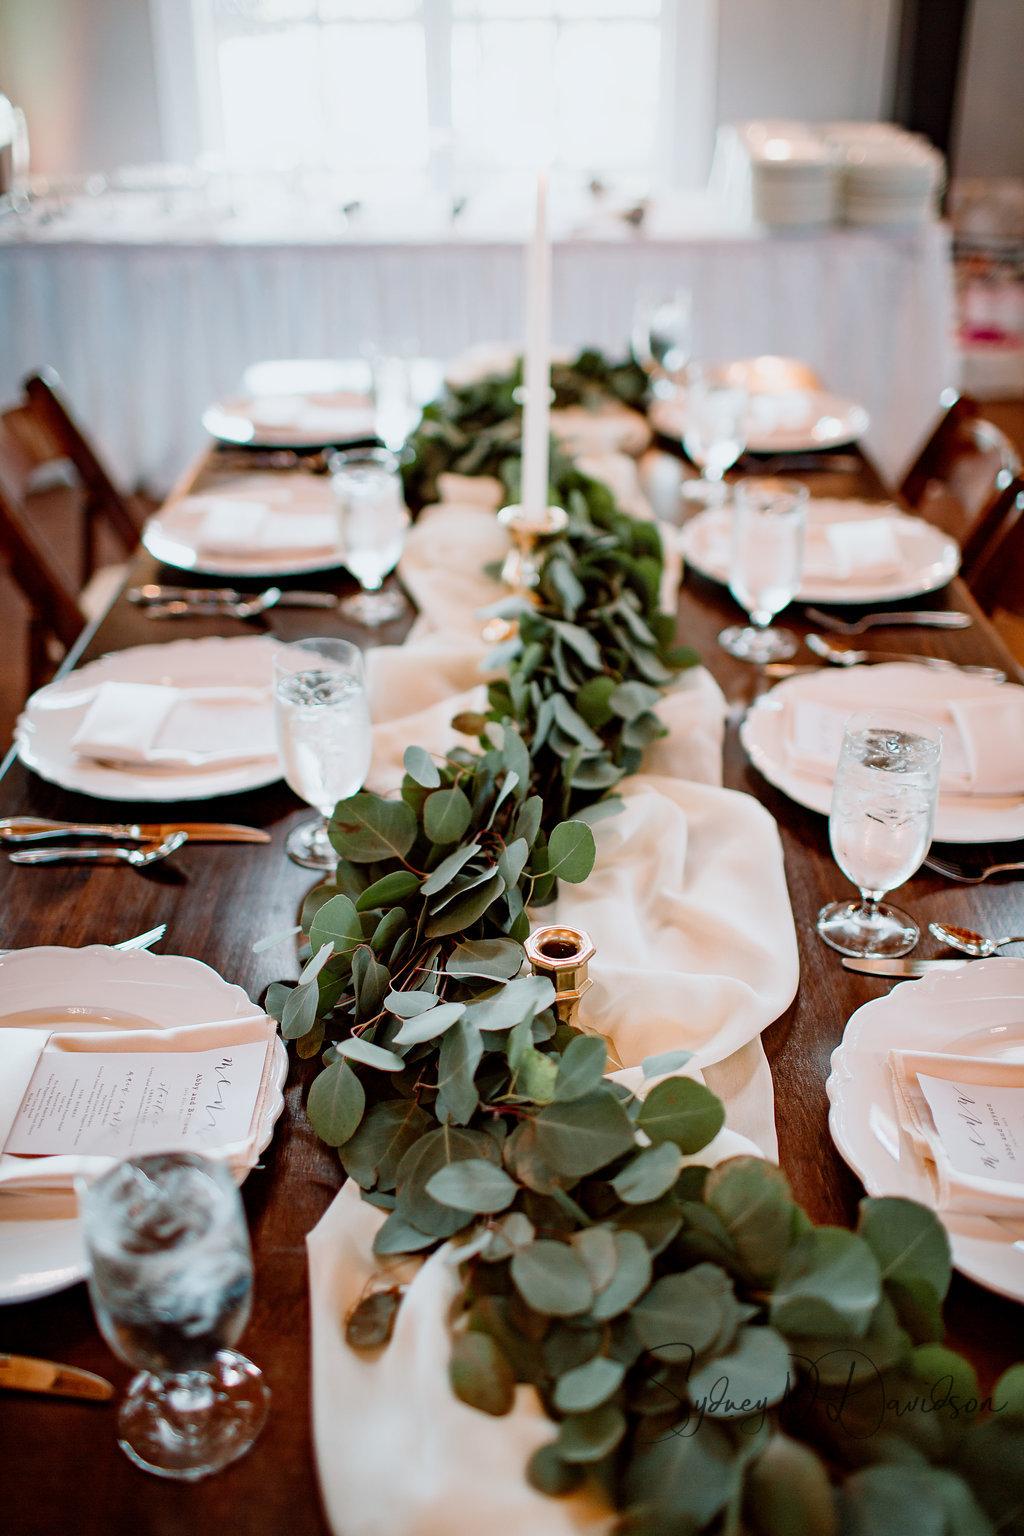 sydney-davidson-wedding-stillwater-oklahoma-wedding-session-traveling-photographer-portrait-tulsa-oklahoma-6639.jpg